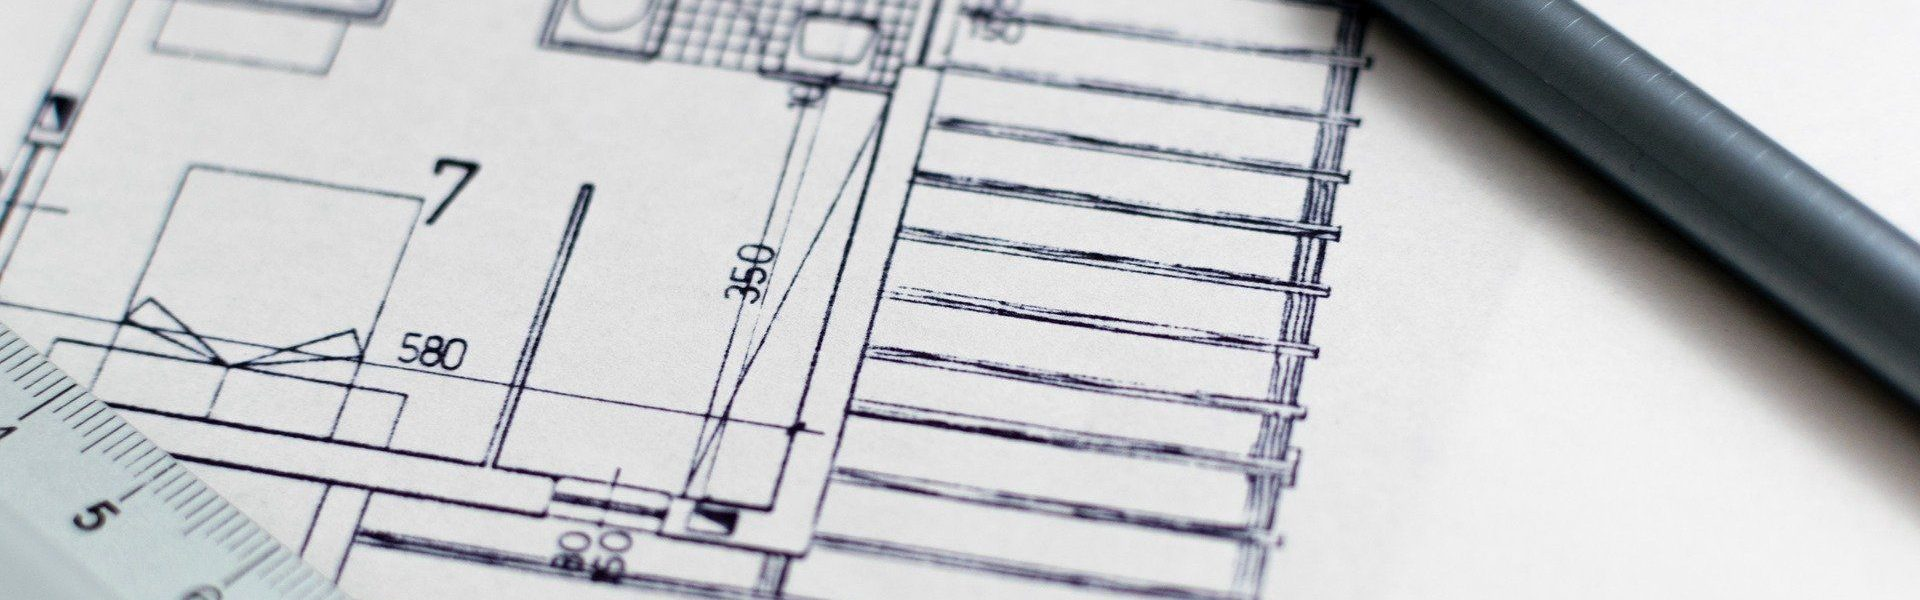 Arquitectura Documentación de obra